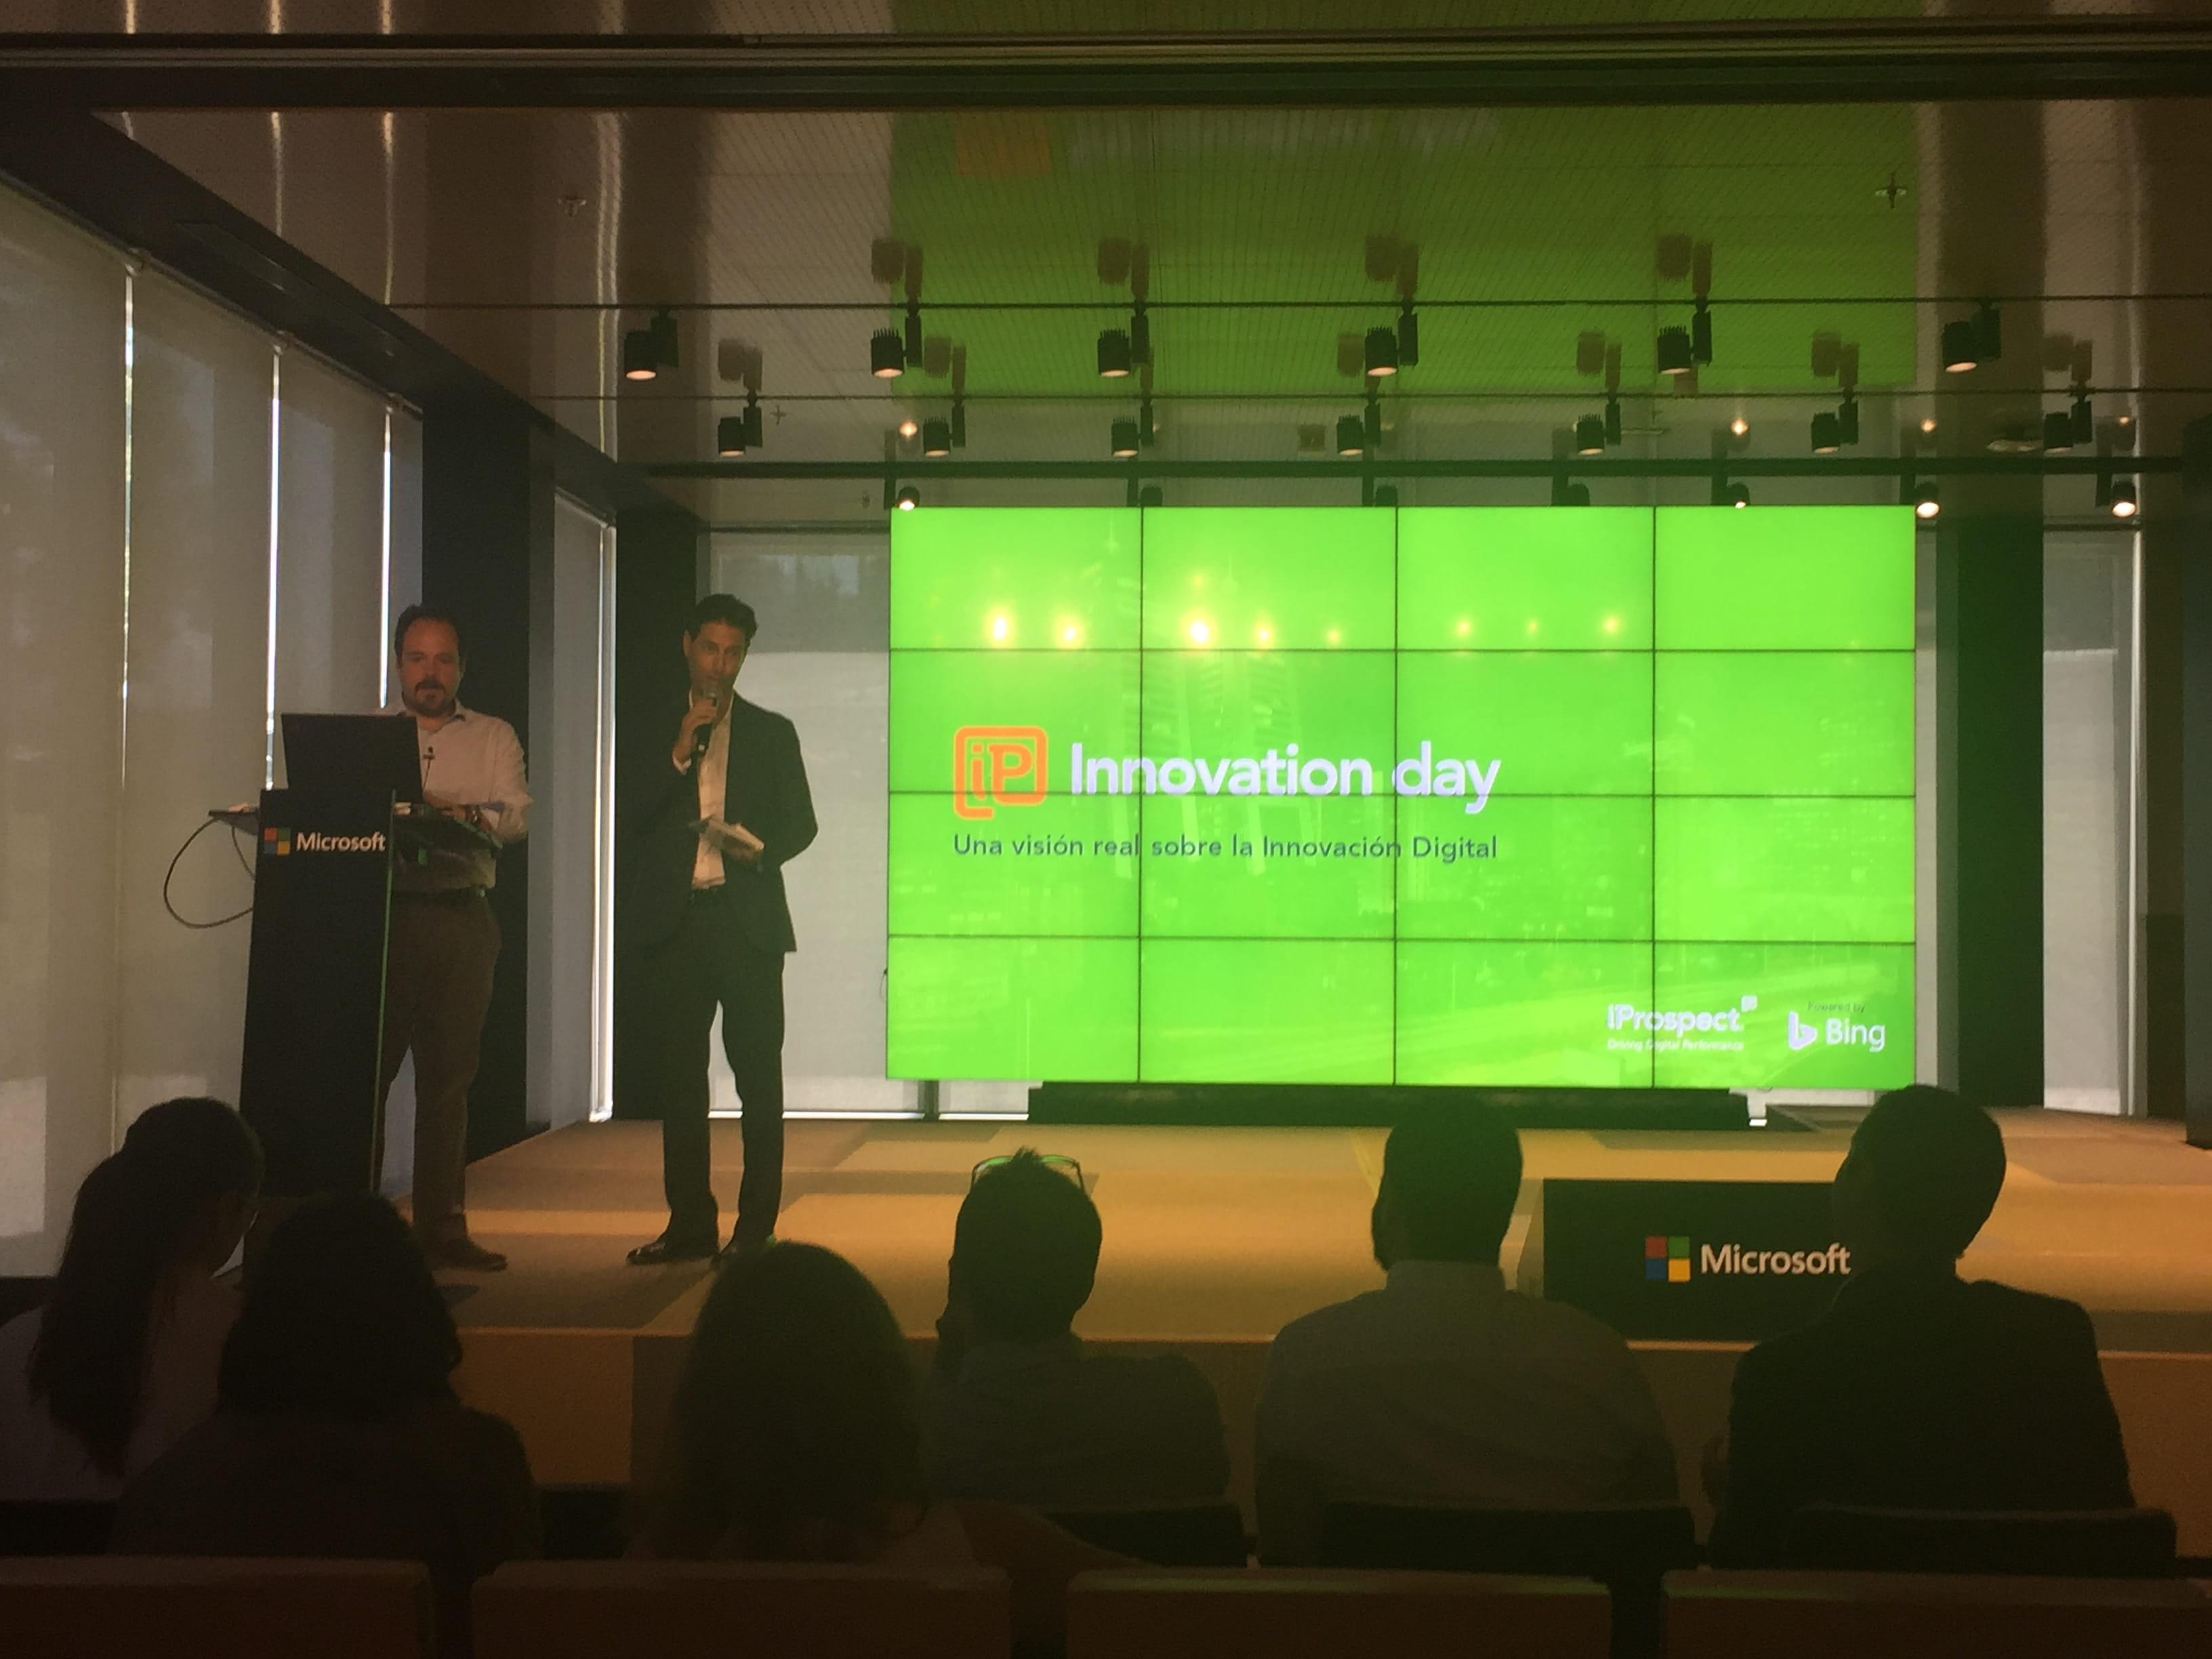 Innovation day ip